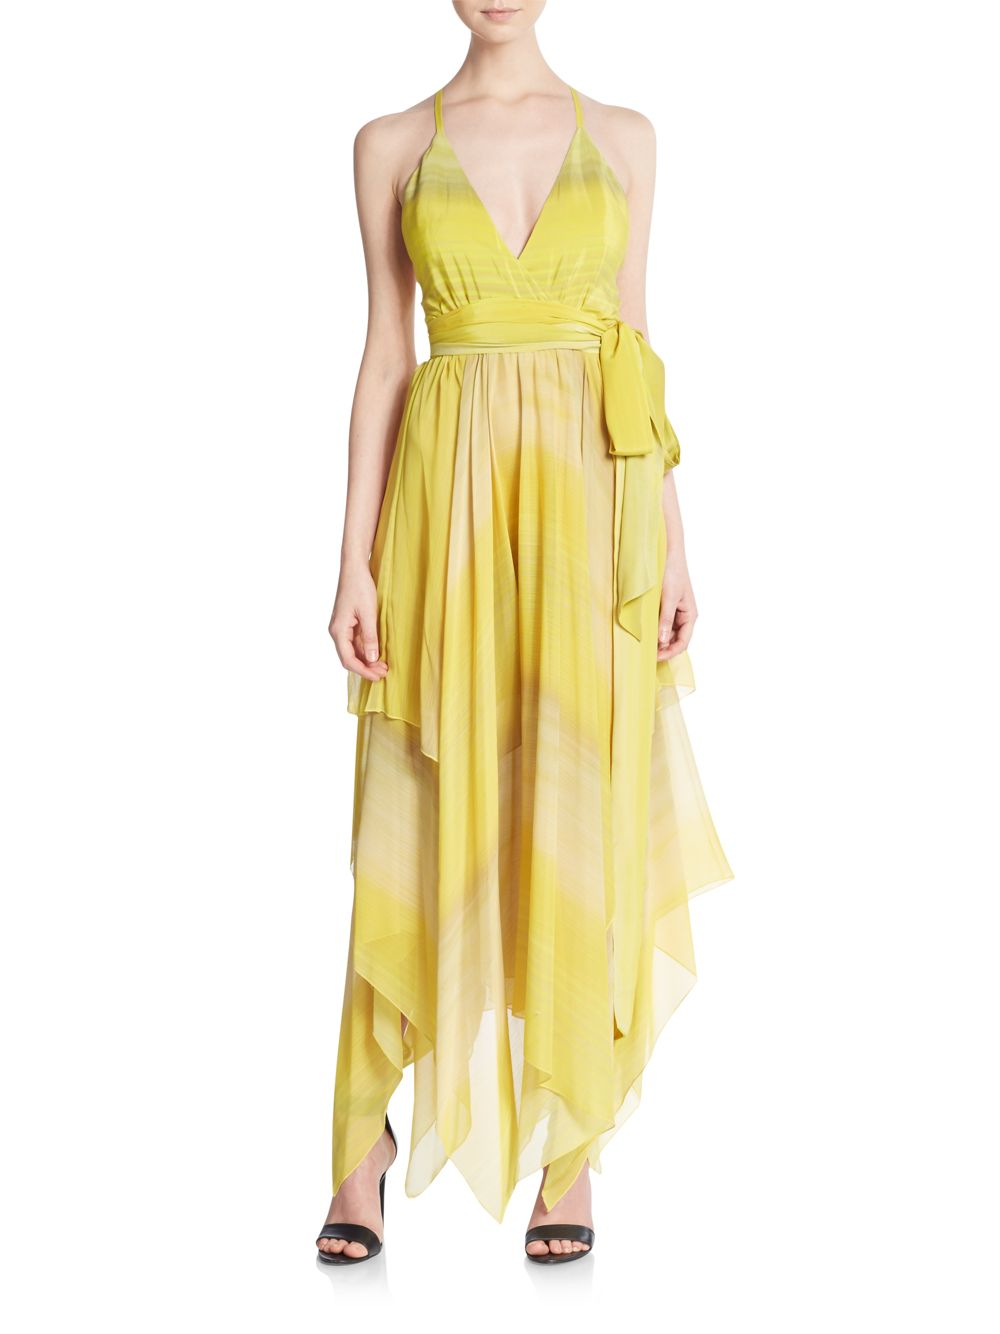 1f2da3d95d Alice + Olivia Tonia Handkerchief Hem Maxi Dress in Yellow - Lyst